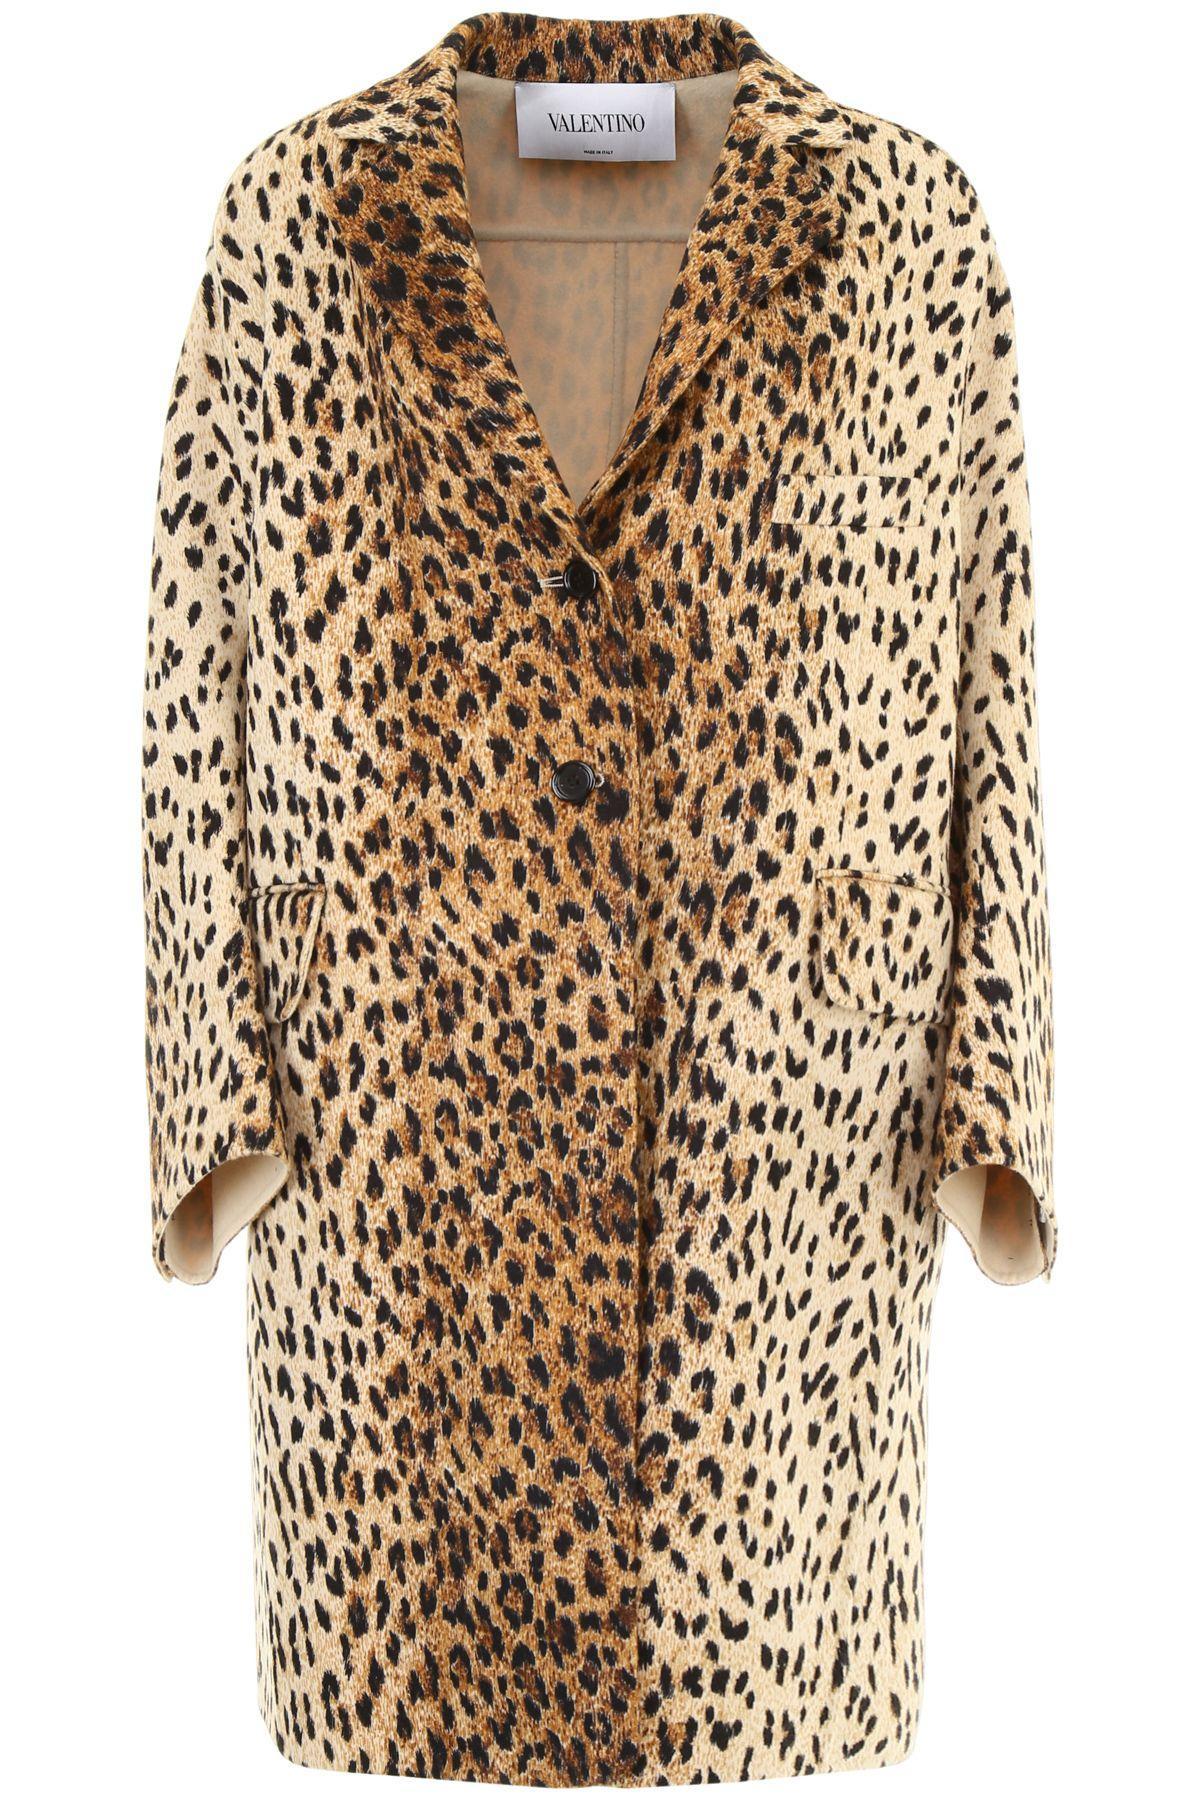 ef77bd0d427 Valentino Leopard Print Coat In Wild Leopardbeige | ModeSens